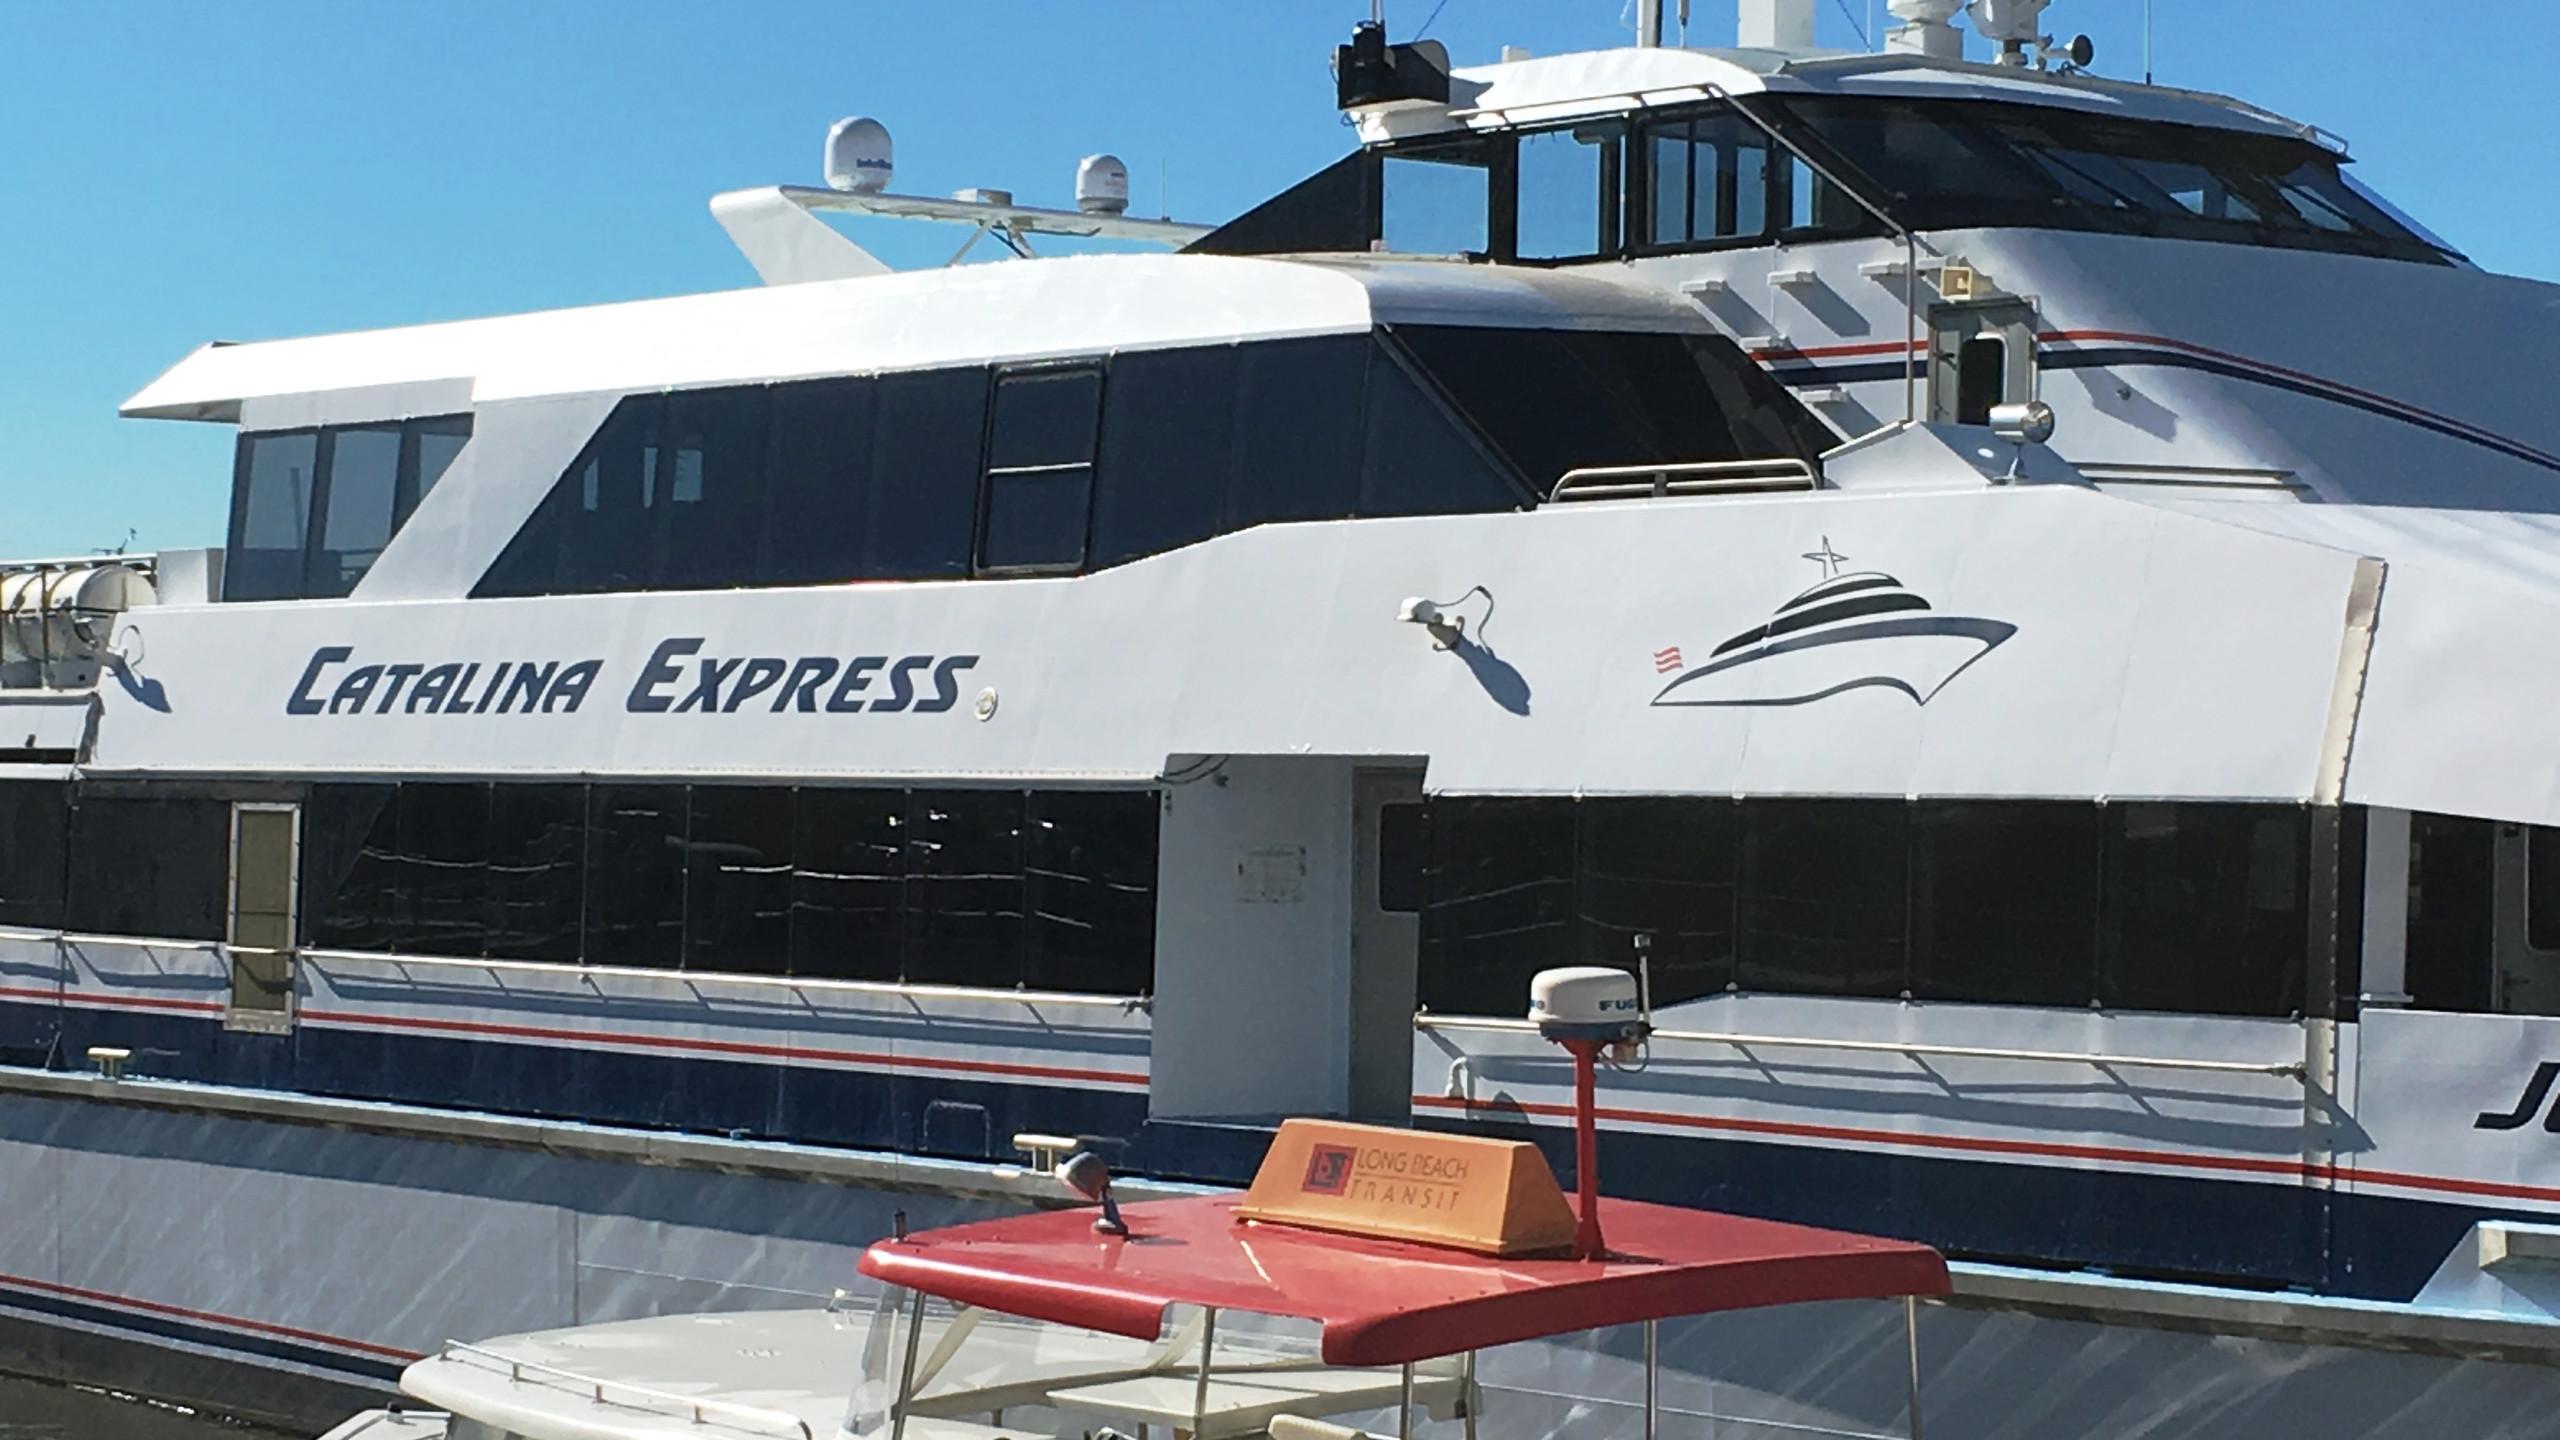 Catalina Express image